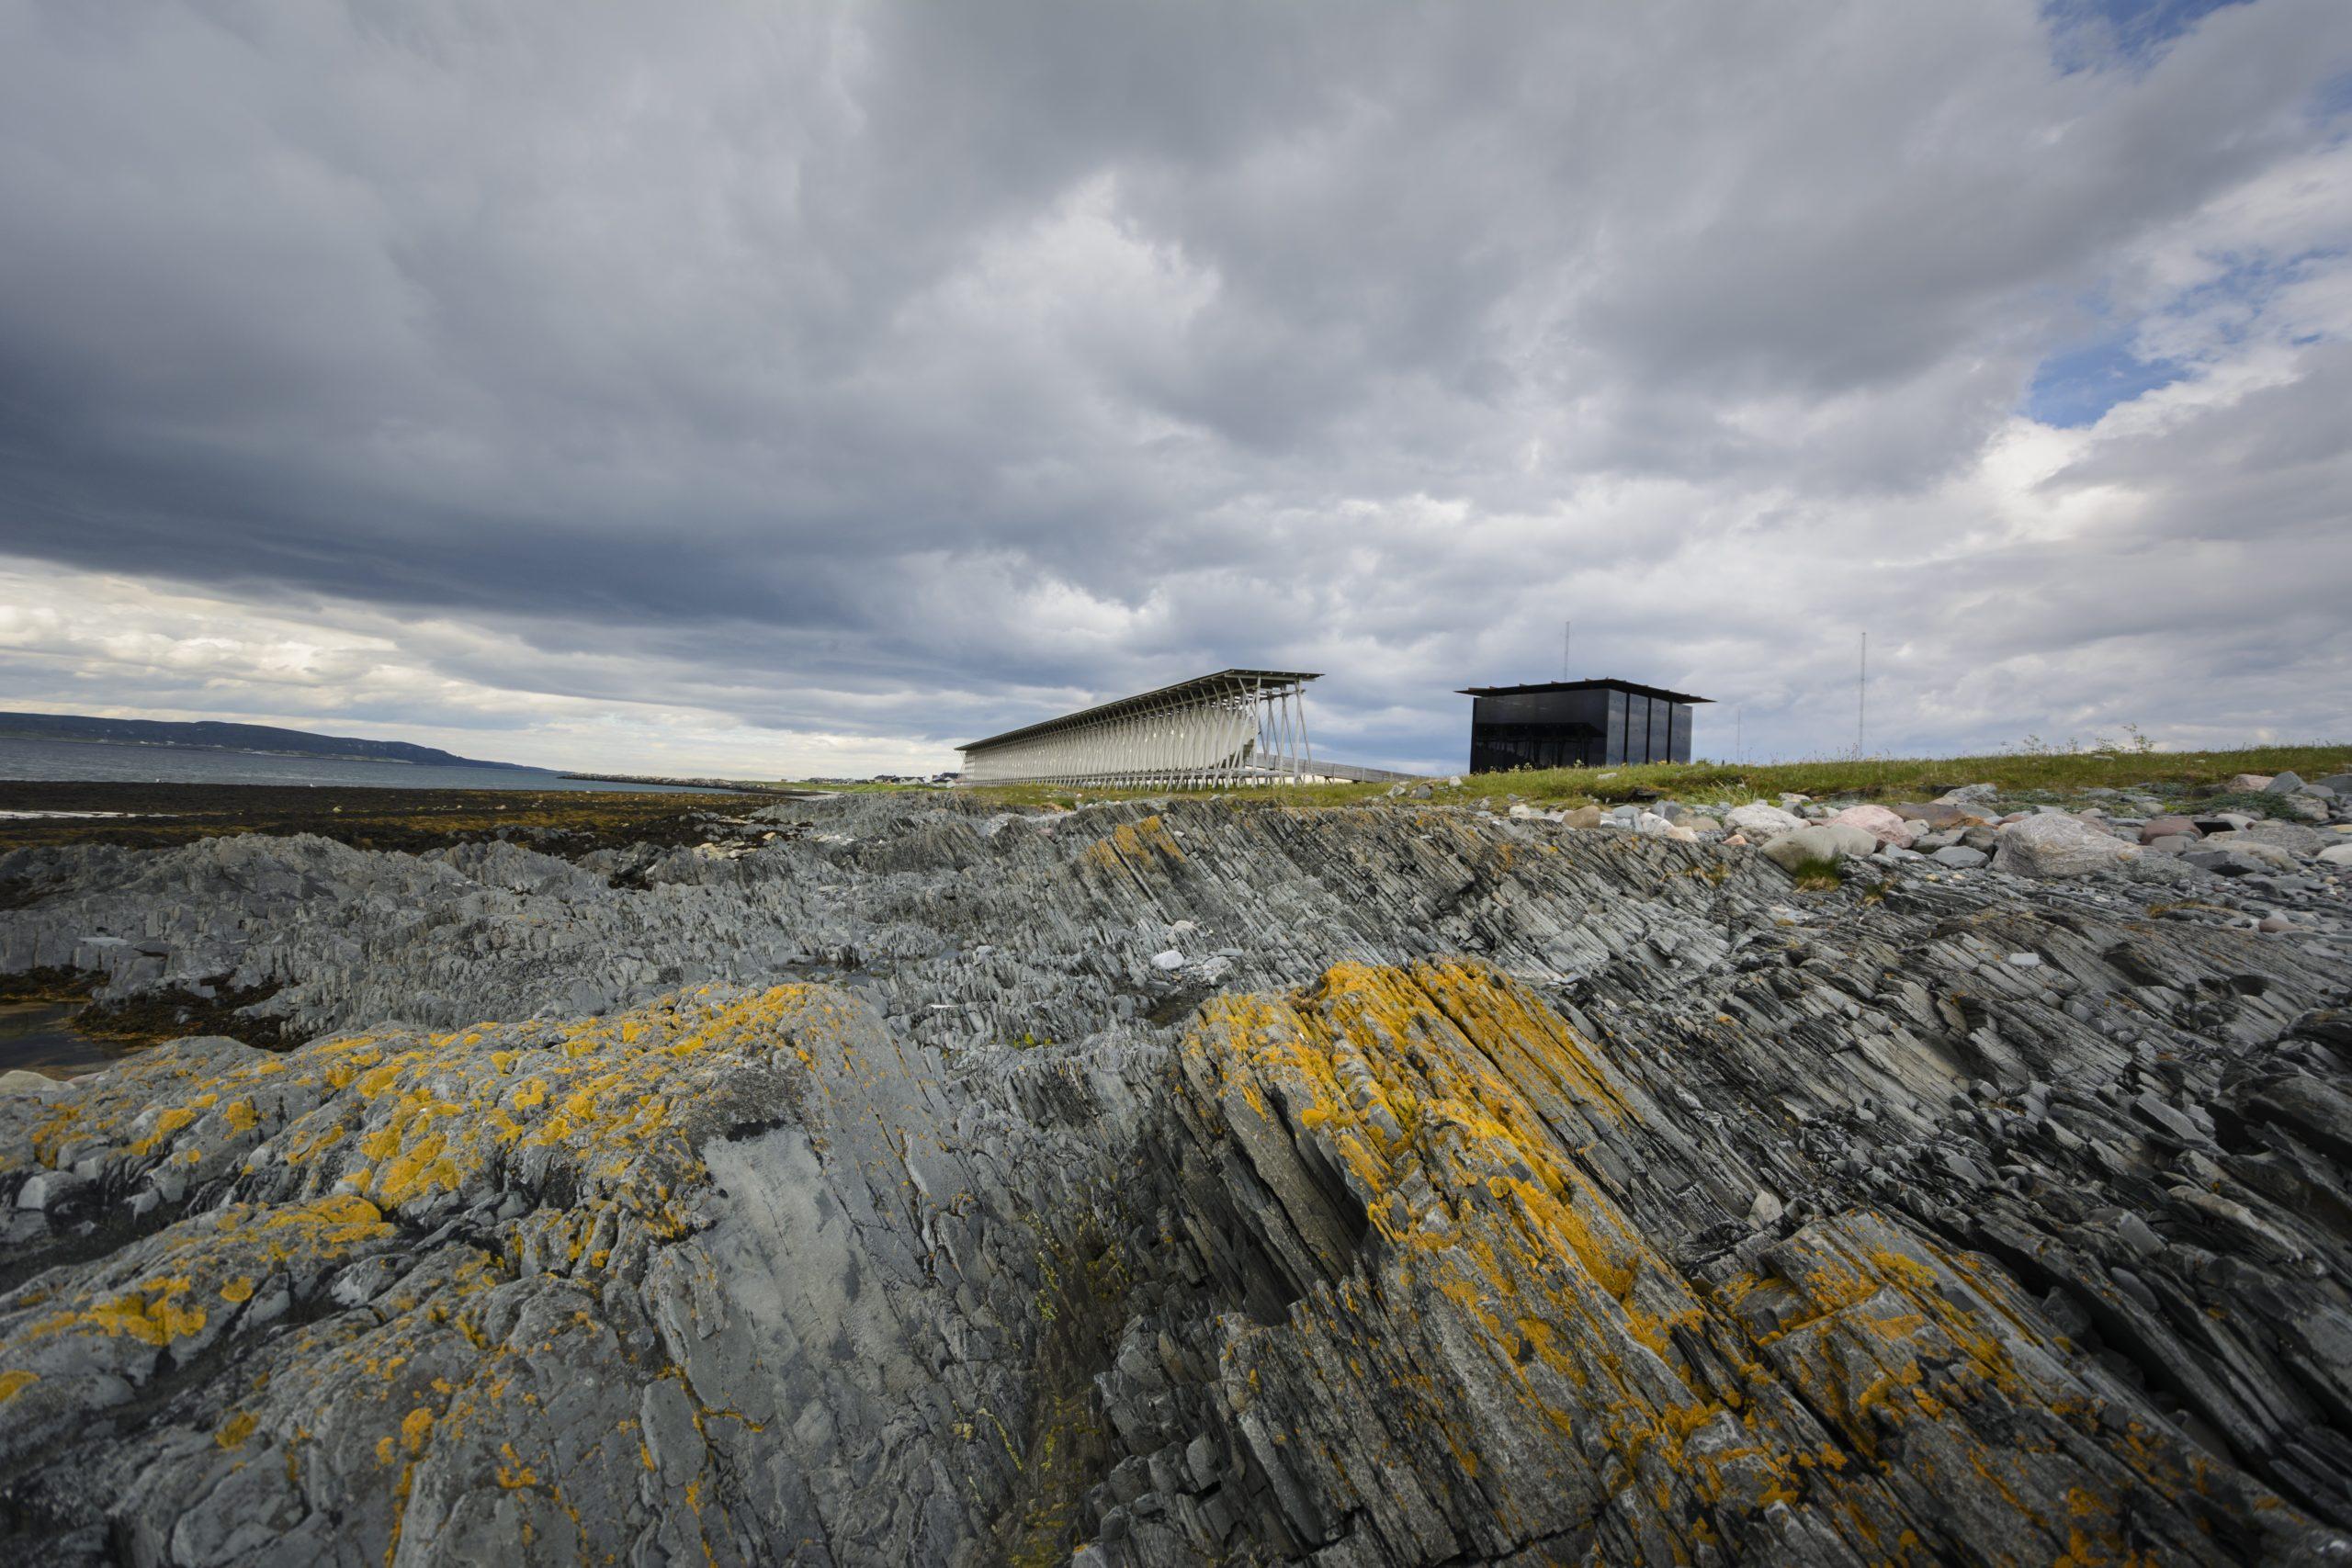 A striking memorial in a striking landscape © Fredrik Fløgstad / Statens vegvesen